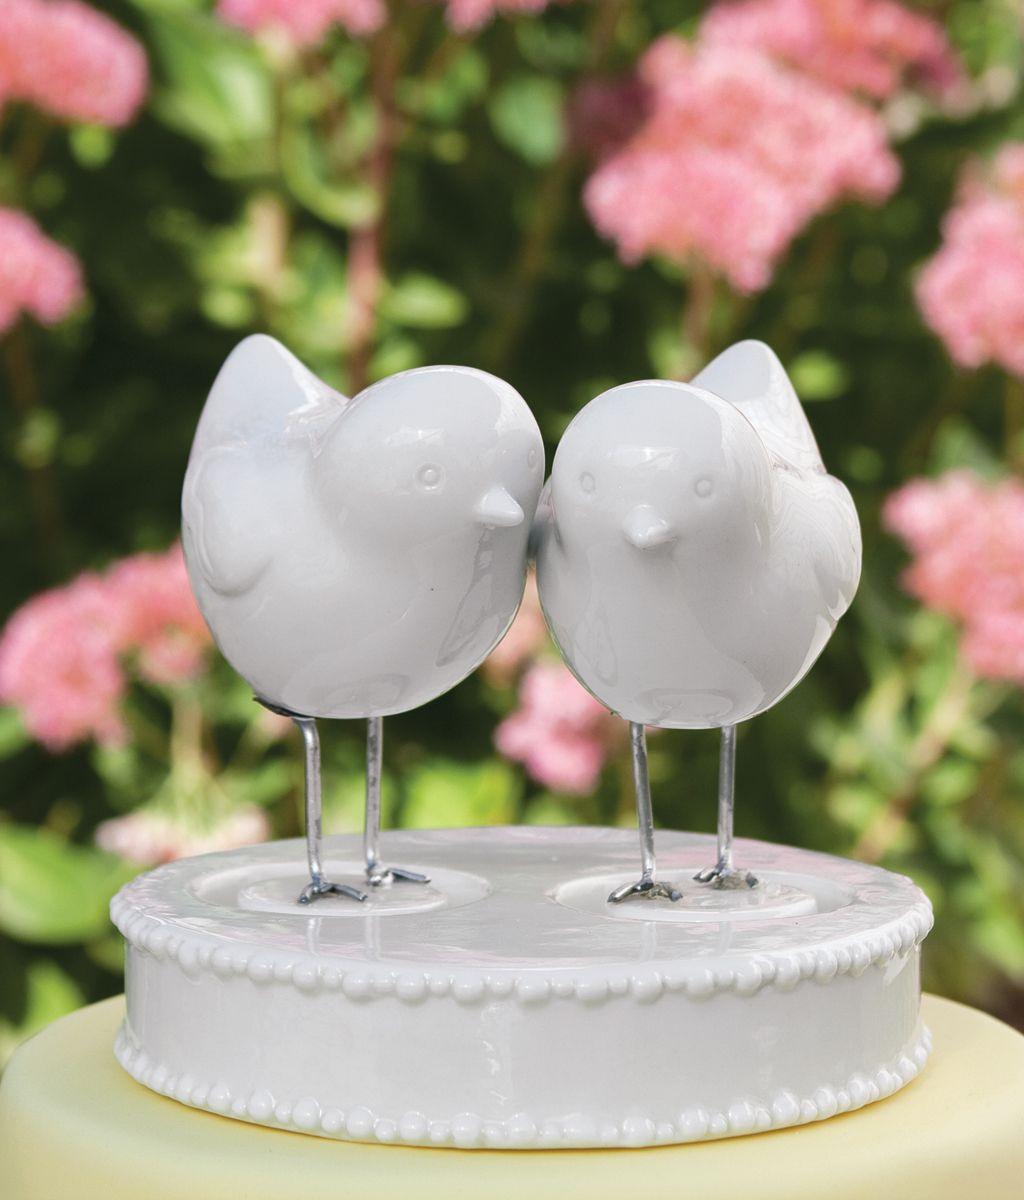 Too Cute Handmade Love Birds Cake Topper Wedding Decorations